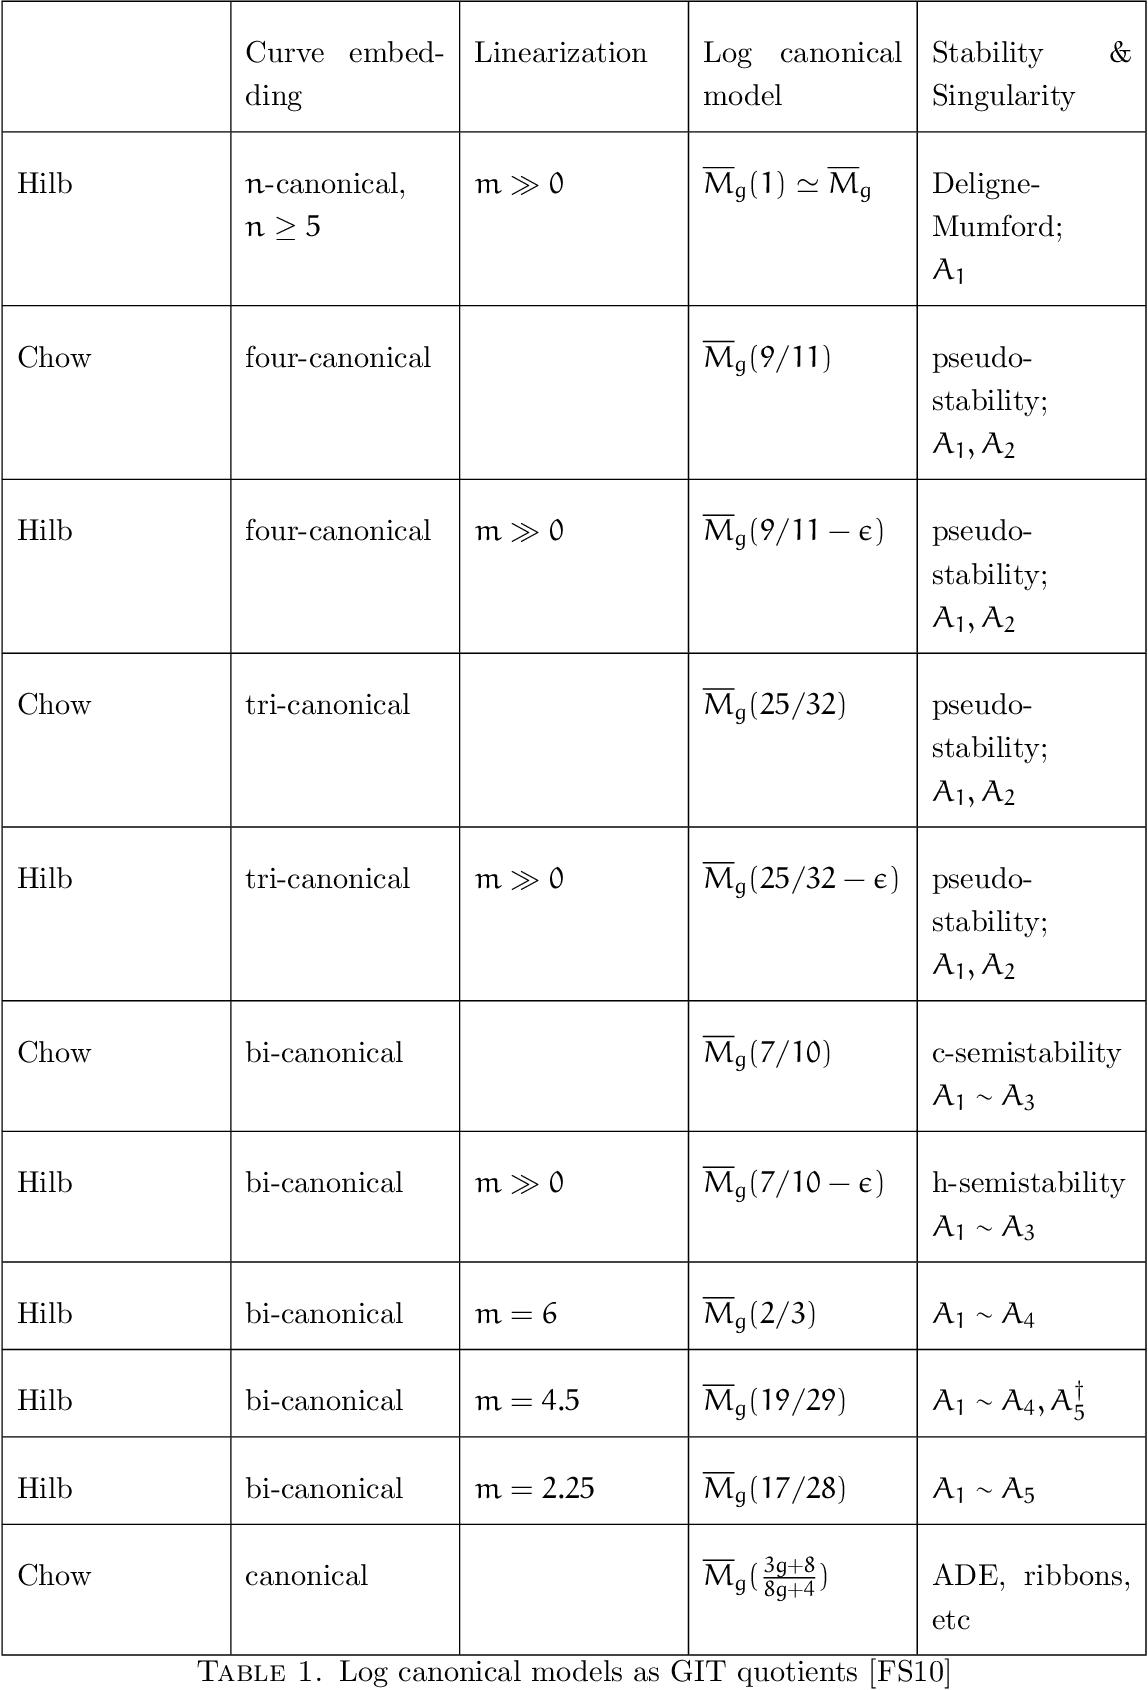 GIT Constructions of Log Canonical Models of M_g - Semantic